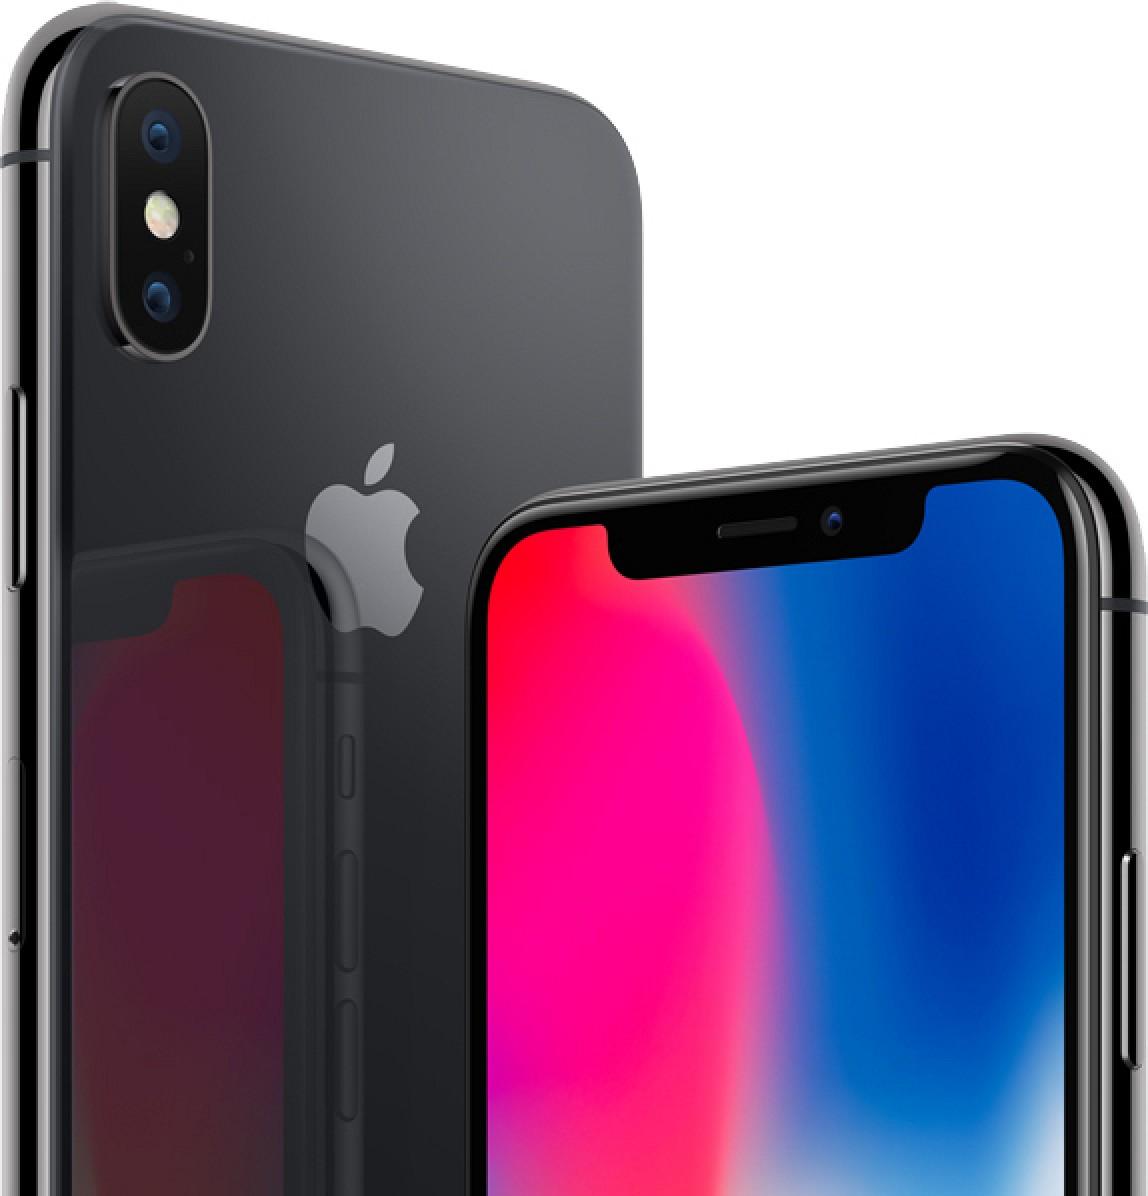 Att confirms iphone x demand has been strong following highly att confirms iphone x demand has been strong following highly anticipated launch mac rumors fandeluxe Image collections